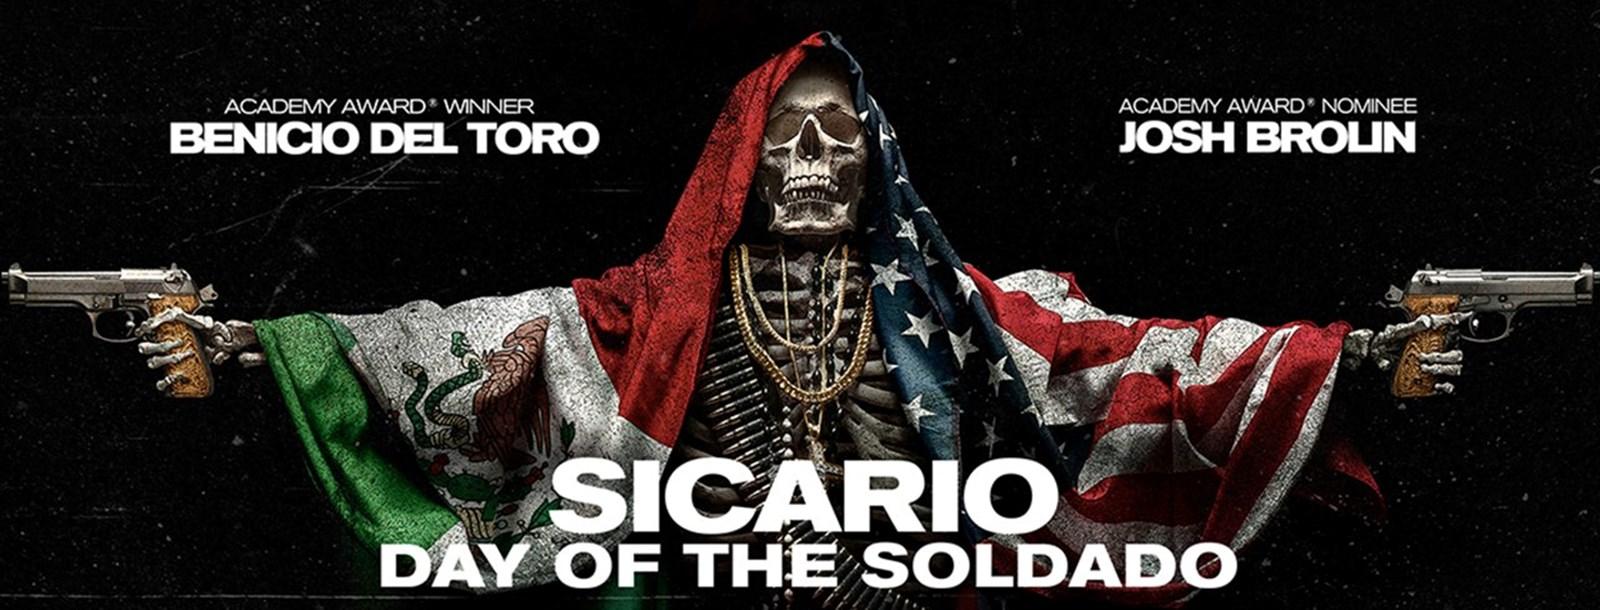 Sicario: Day of the Soldado - Sasvim podnošljivo